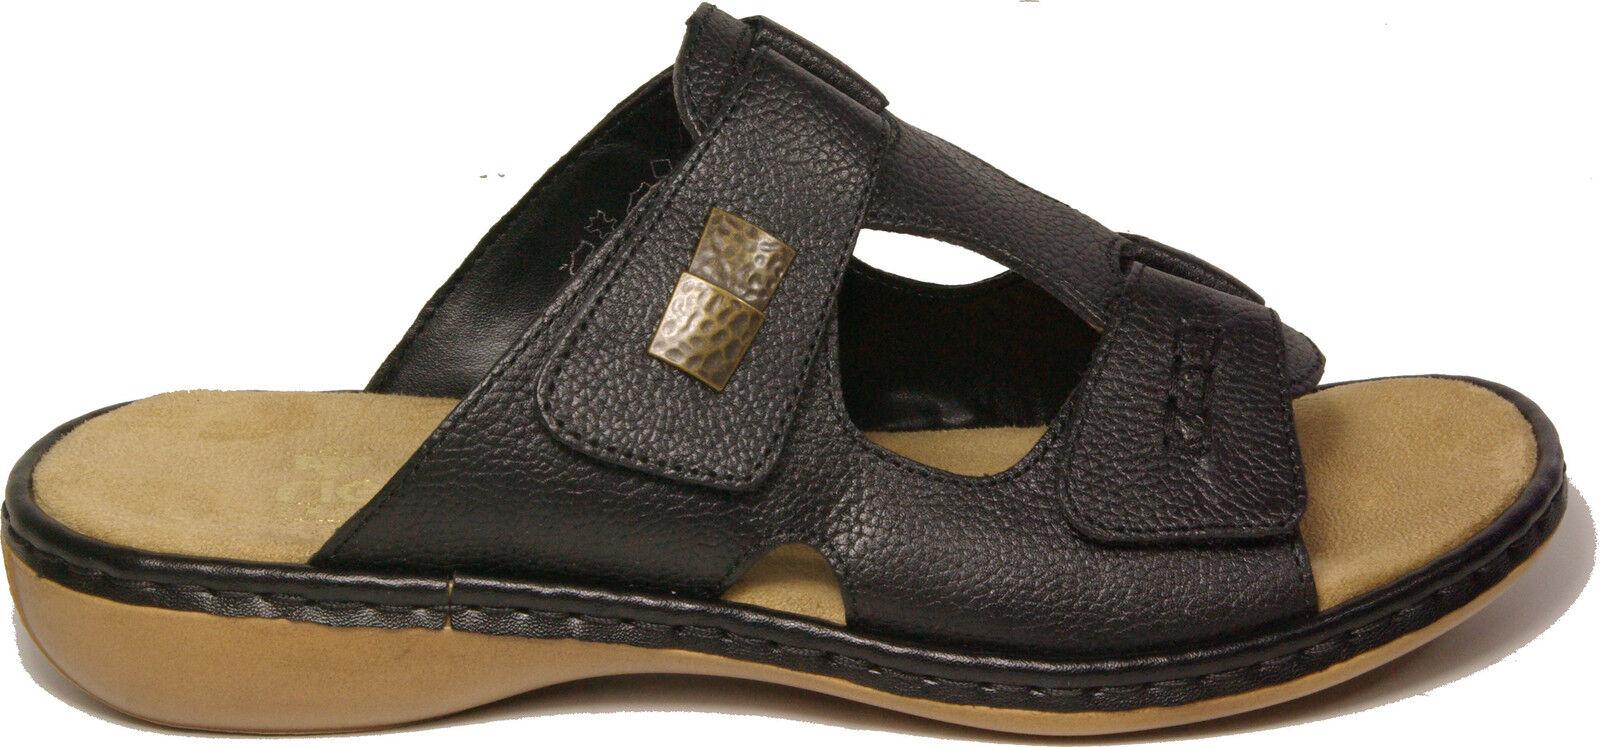 Rieker zapatos sandalias velcro Echt Leder cuña negro con cuña Leder nuevo dfcea9